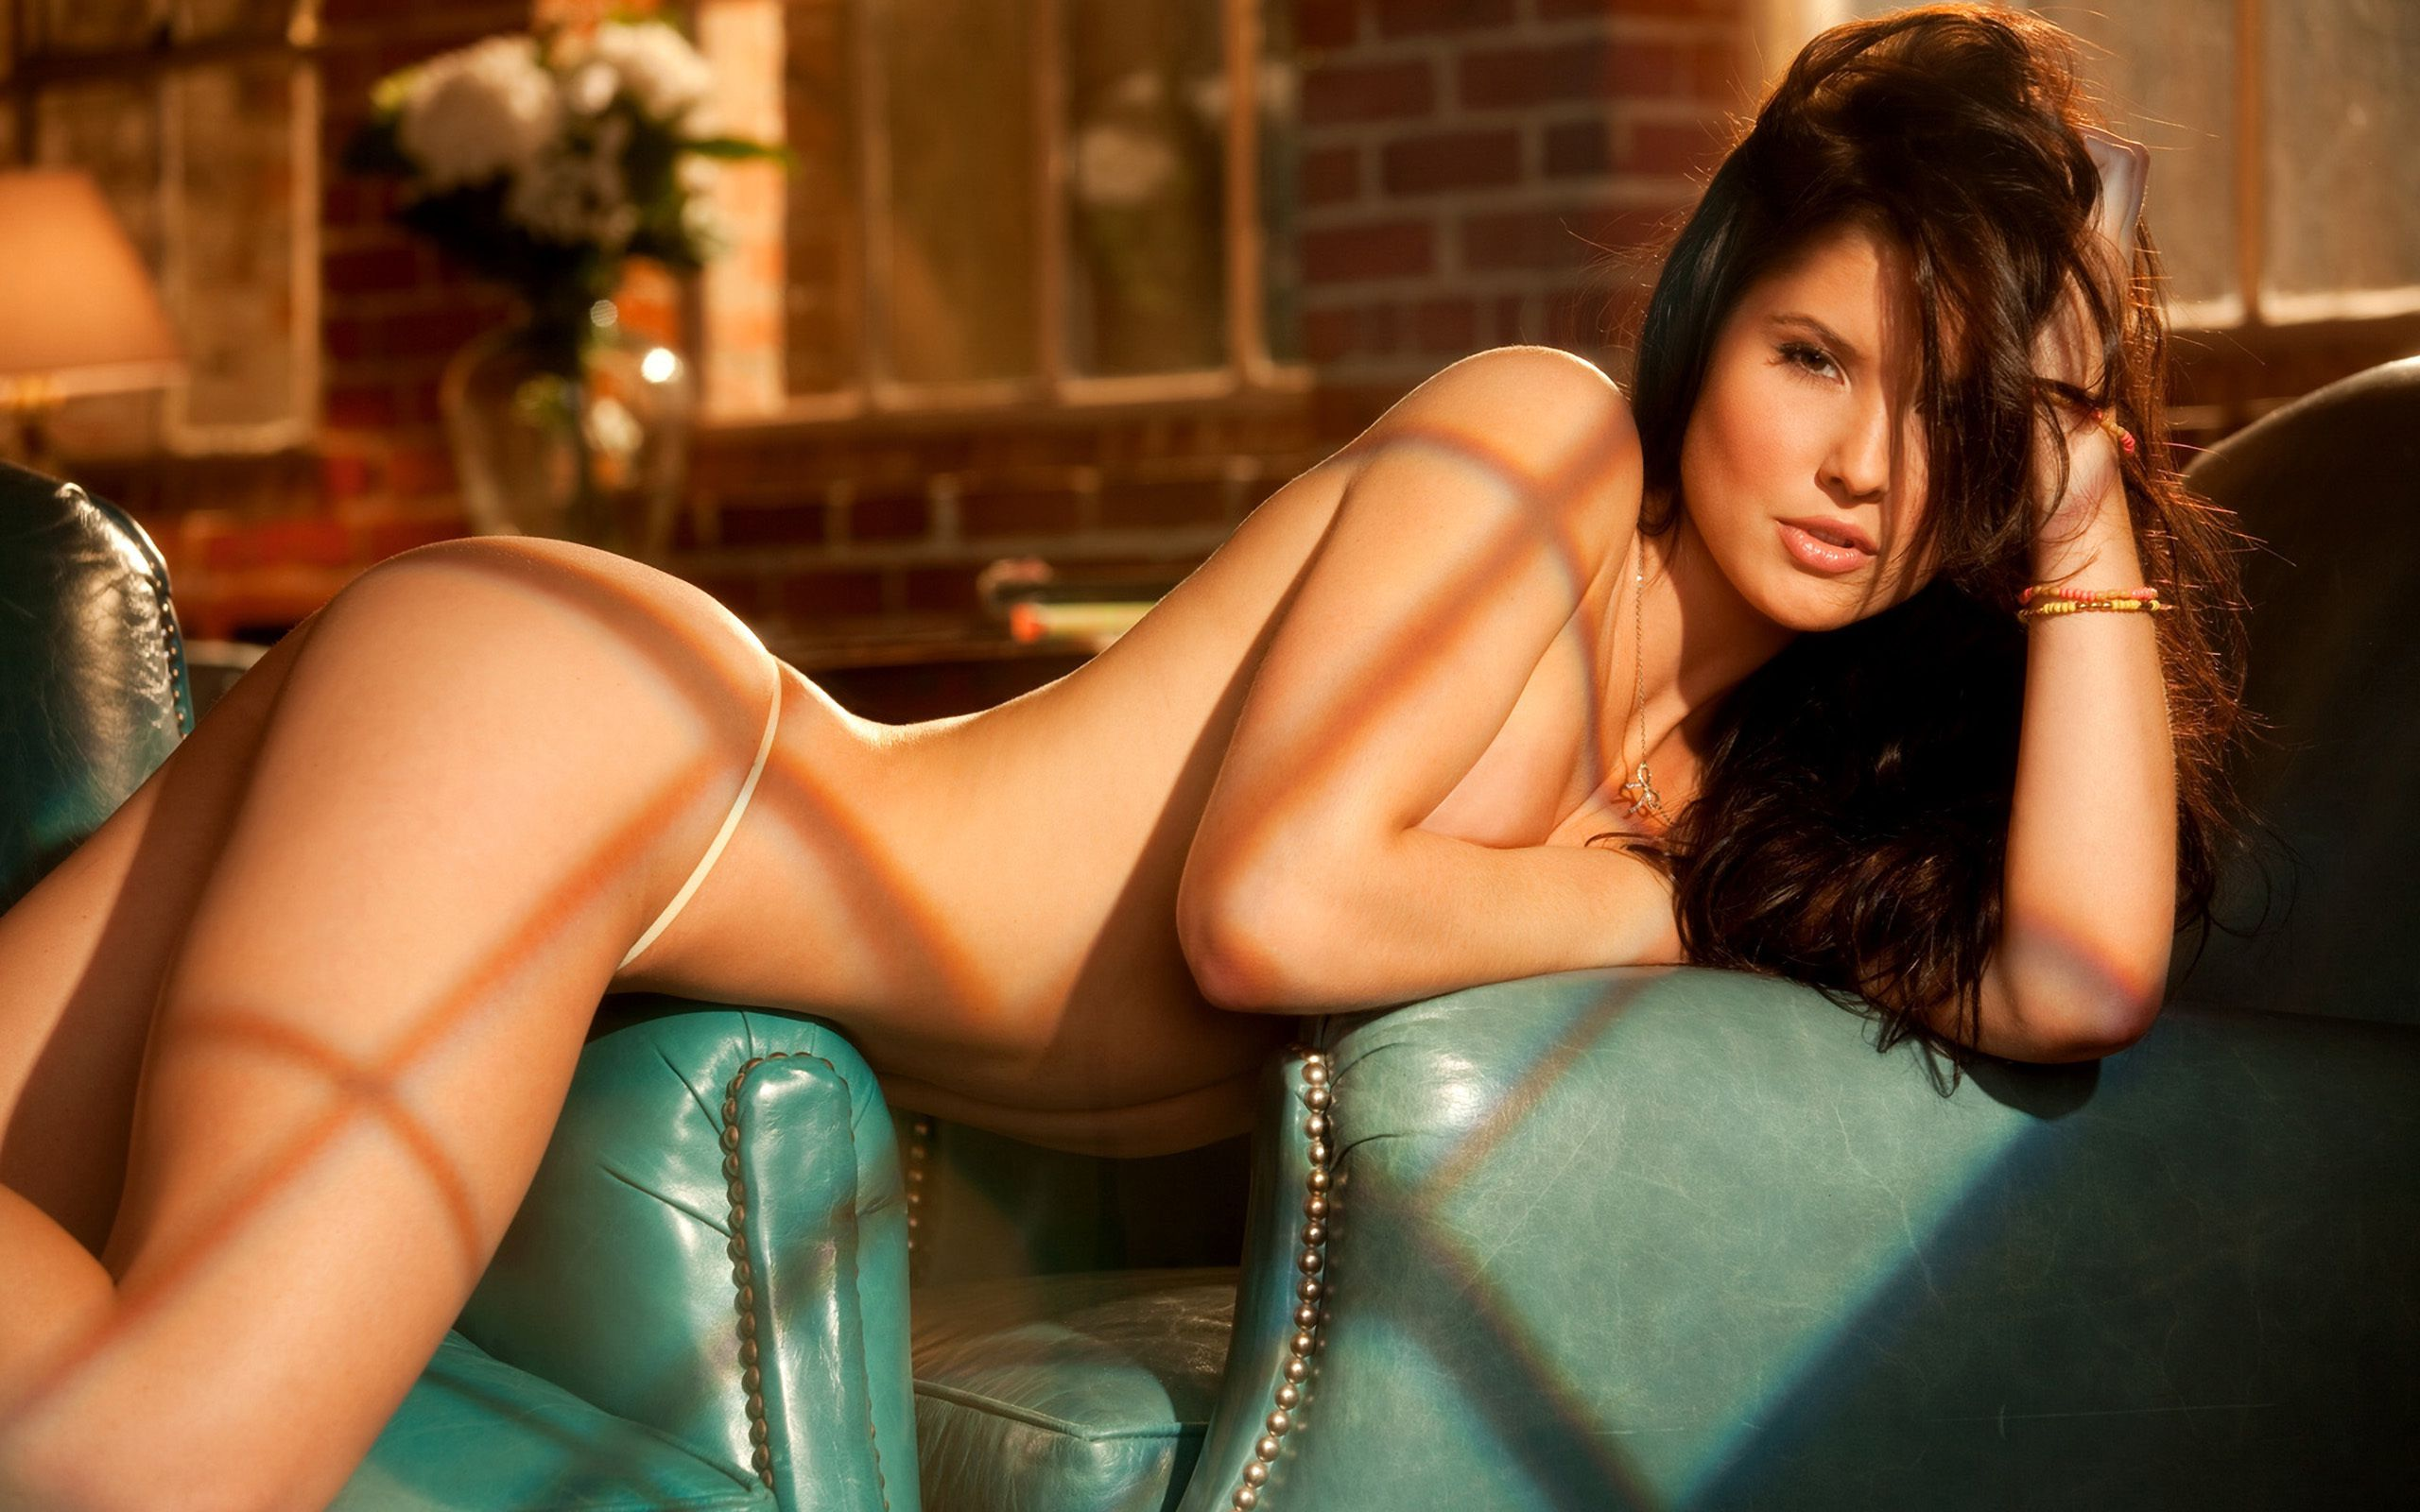 bigbutt-pussy-arlene-serna-hot-naked-cougar-pictures